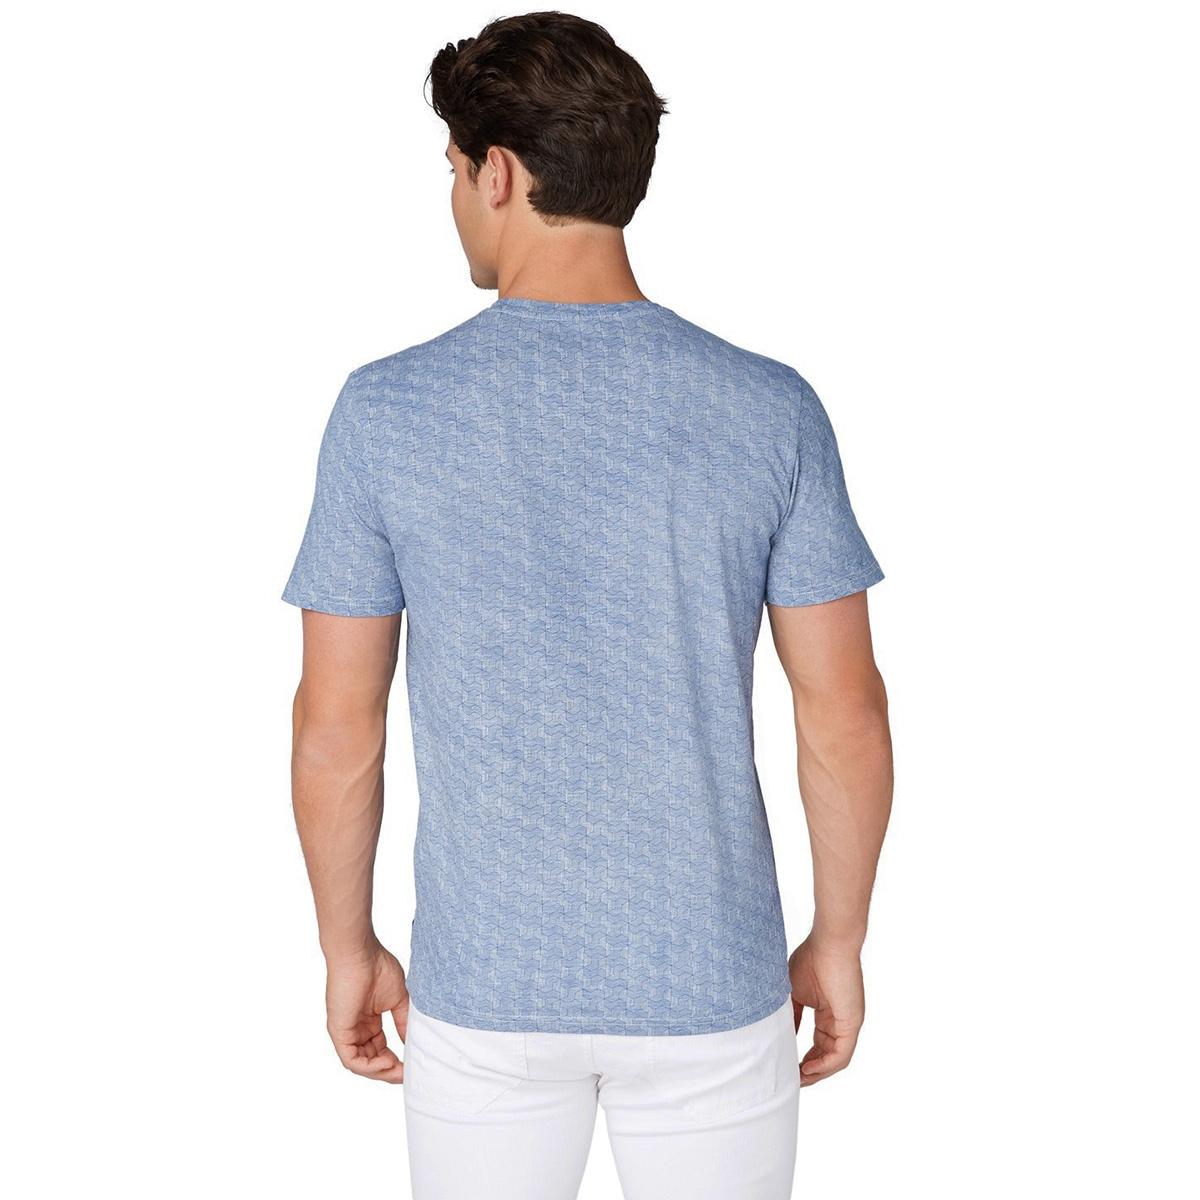 t shirt met all over print 1012839xx10 tom tailor t-shirt 19048